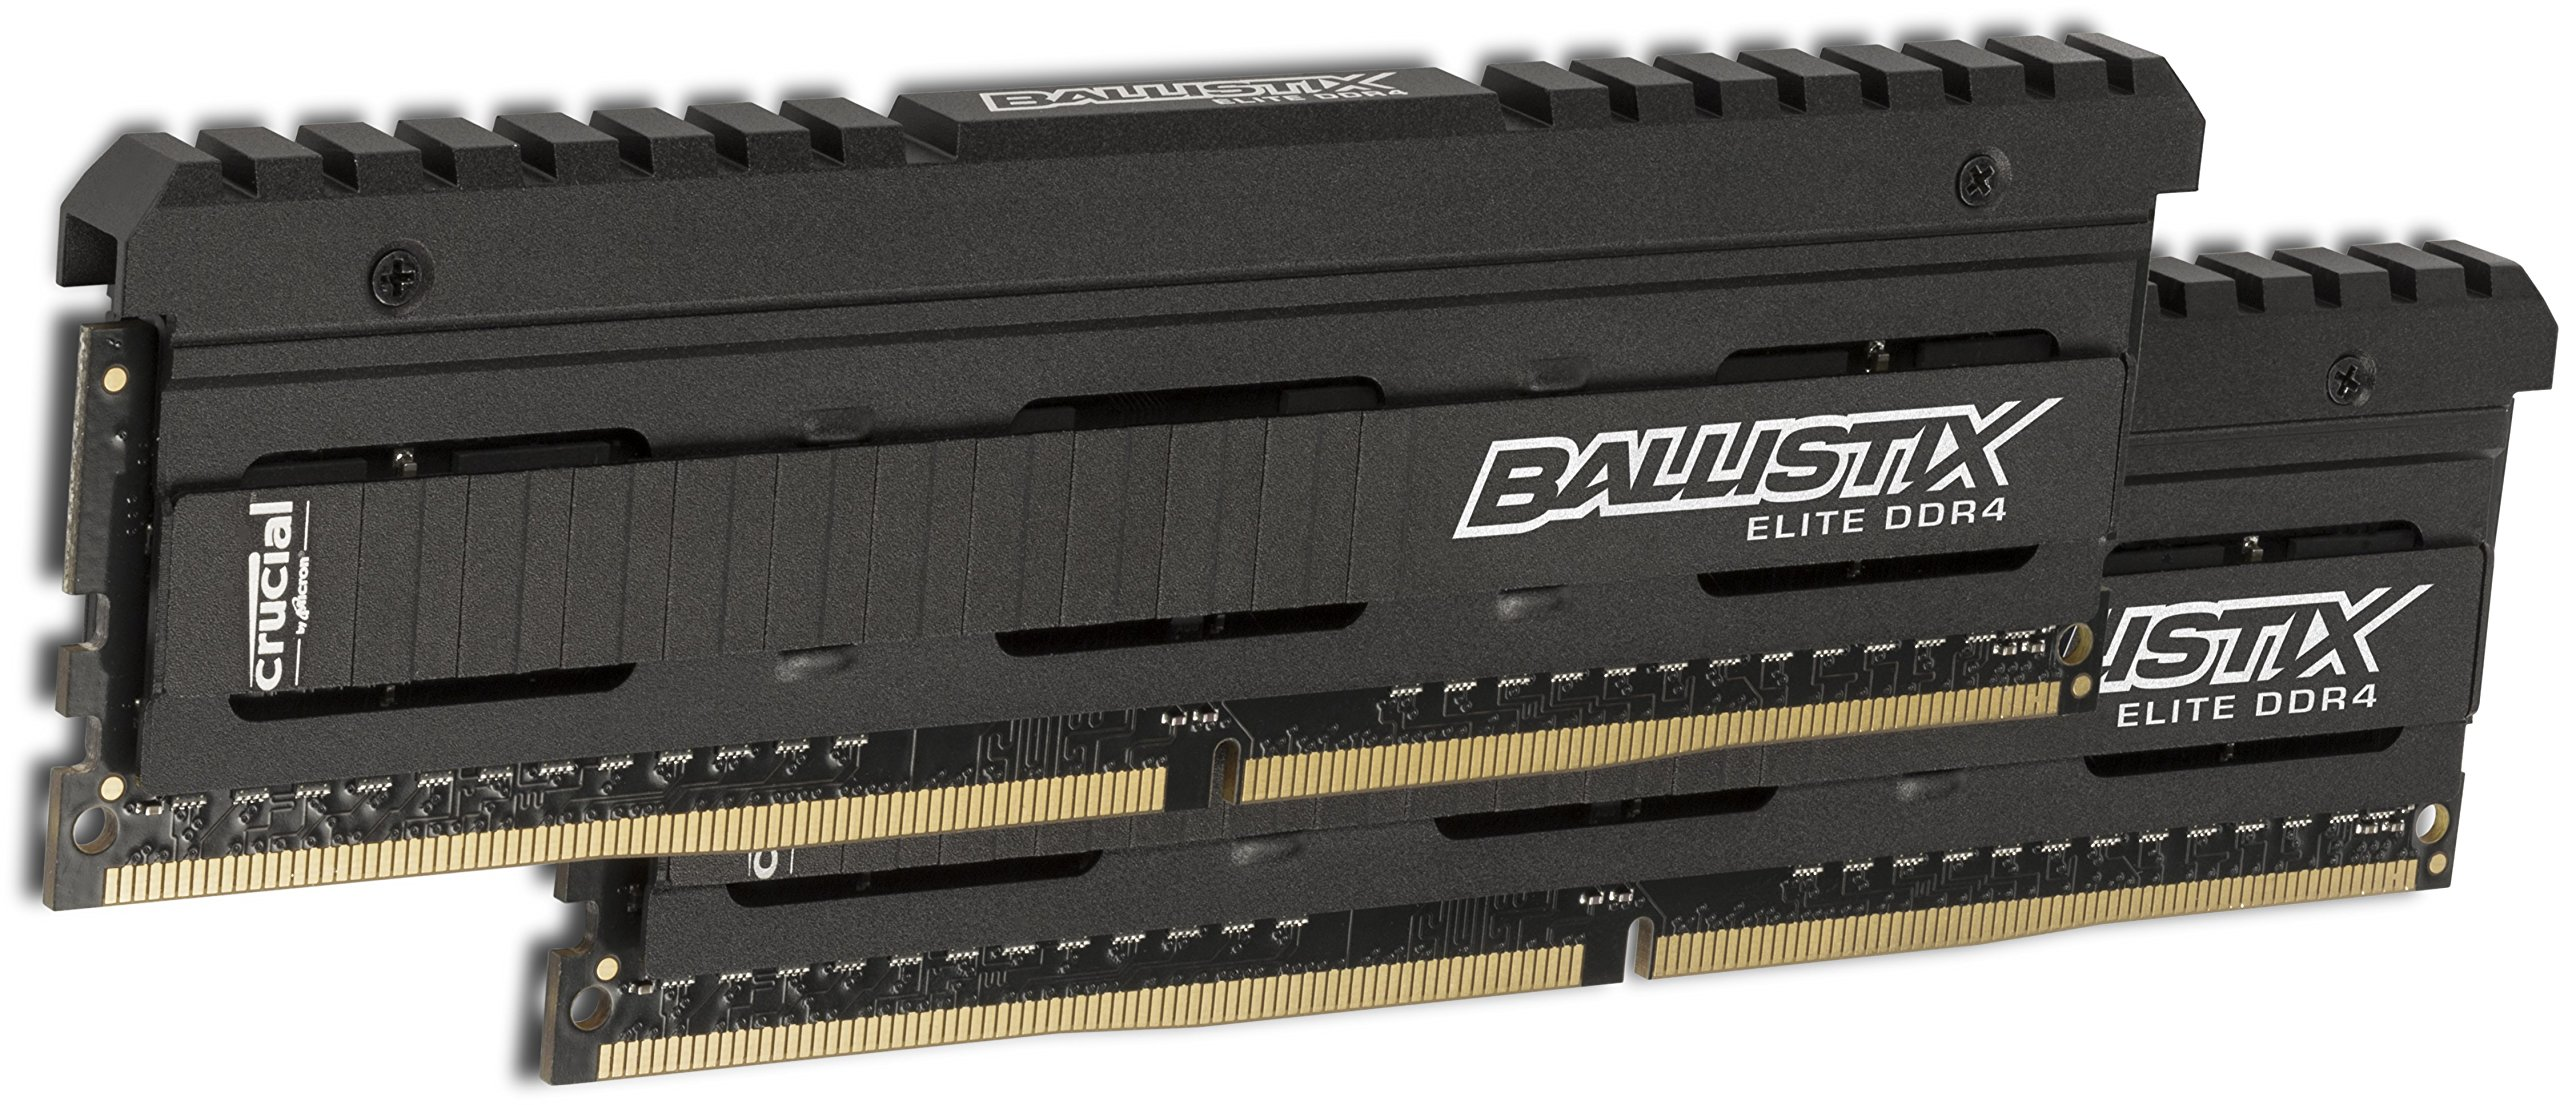 Crucial Ballistix Elite 16gb Kit [8gbx2] Ddr4-2666 Udimm - 16 Gb [2 X 8 Gb] - Ddr4 Sdram - 2666 Mhz Ddr4-2666/pc4-21300 - 1.20 V - Non-ecc - Unbuffered - 288-pin - Dimm (ble2k8g4d26afea)